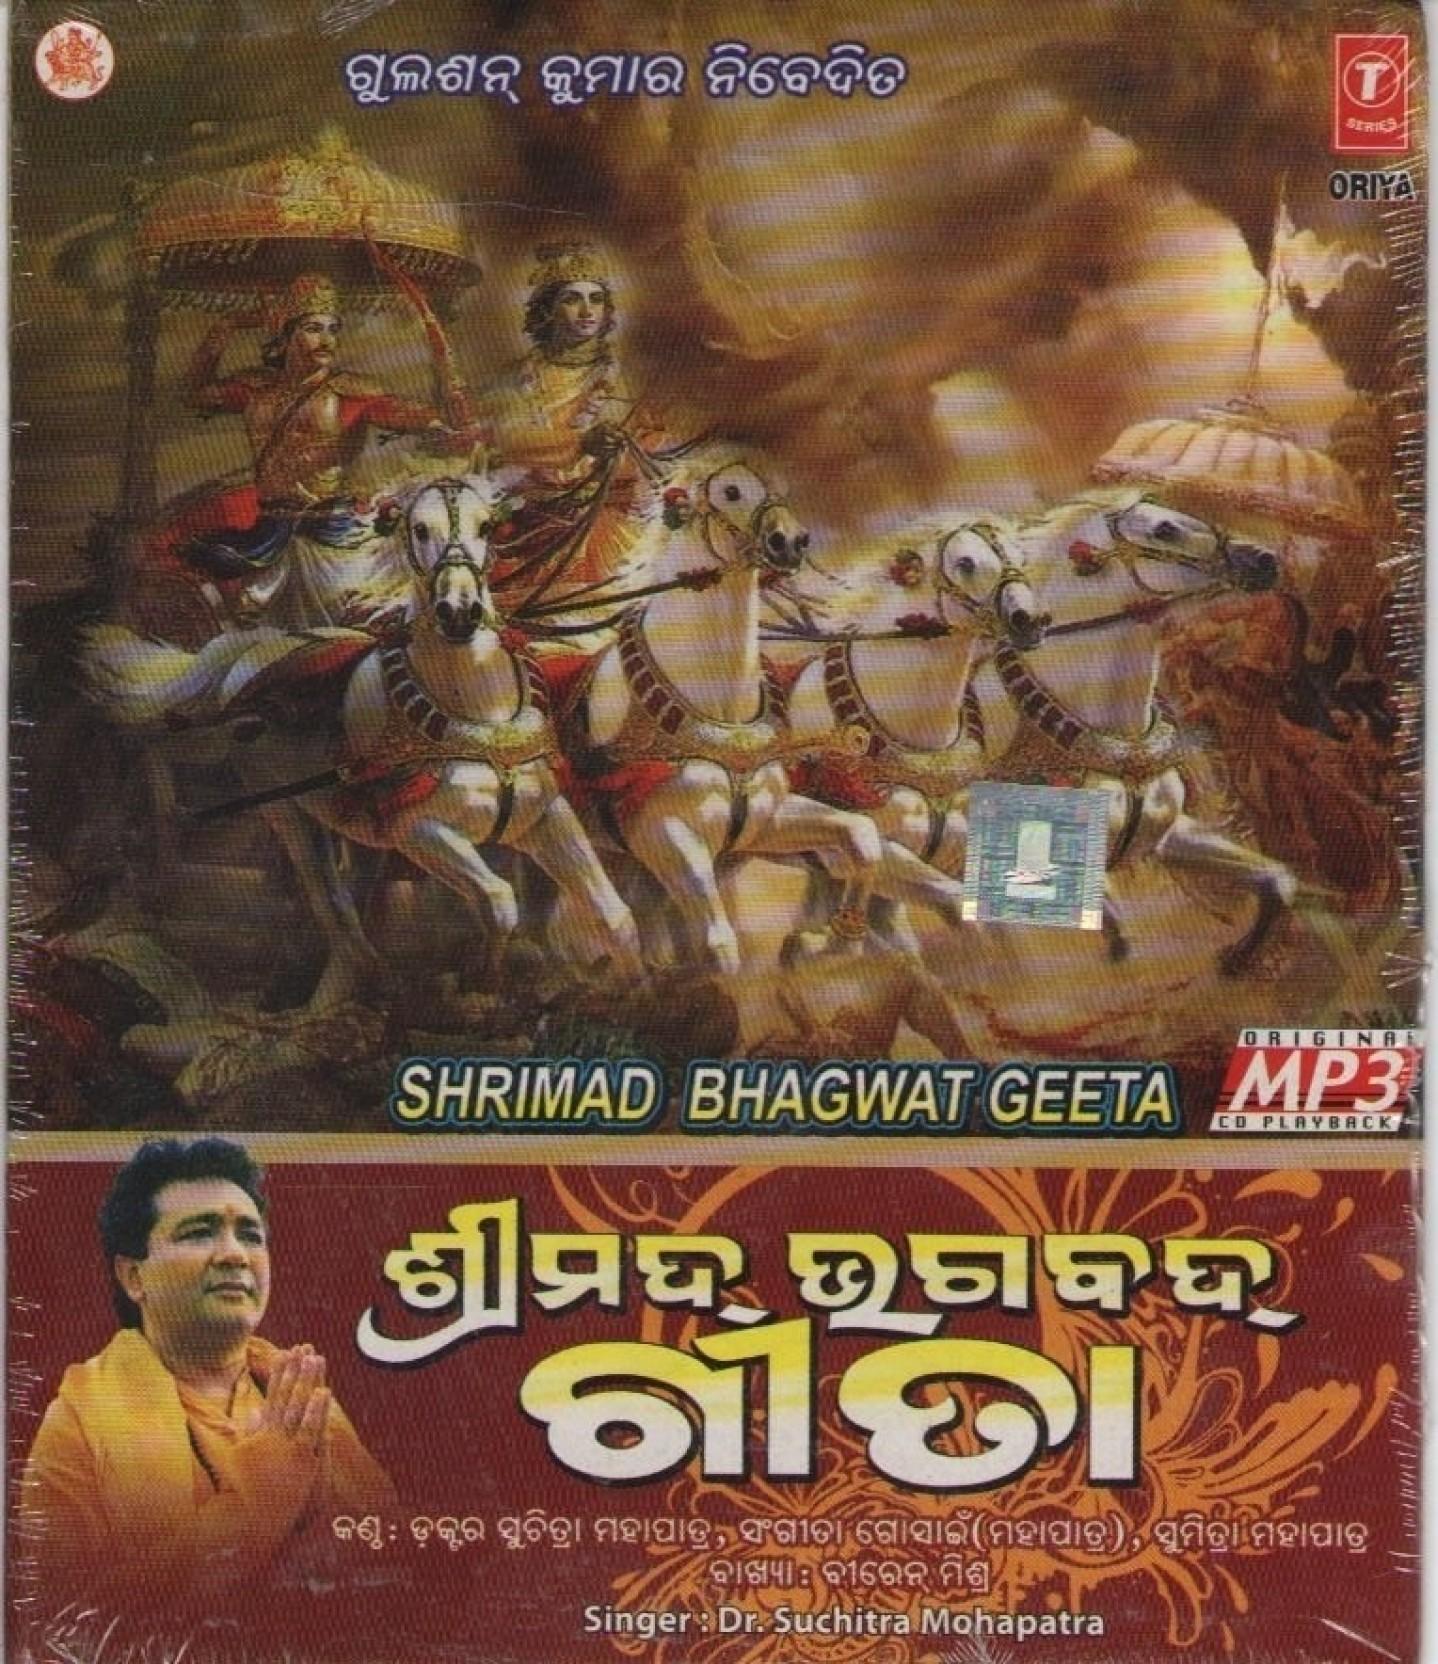 Mere Yaar Bathere Ne Mp3 Download: Shrimad Bhagwat Geeta Music MP3